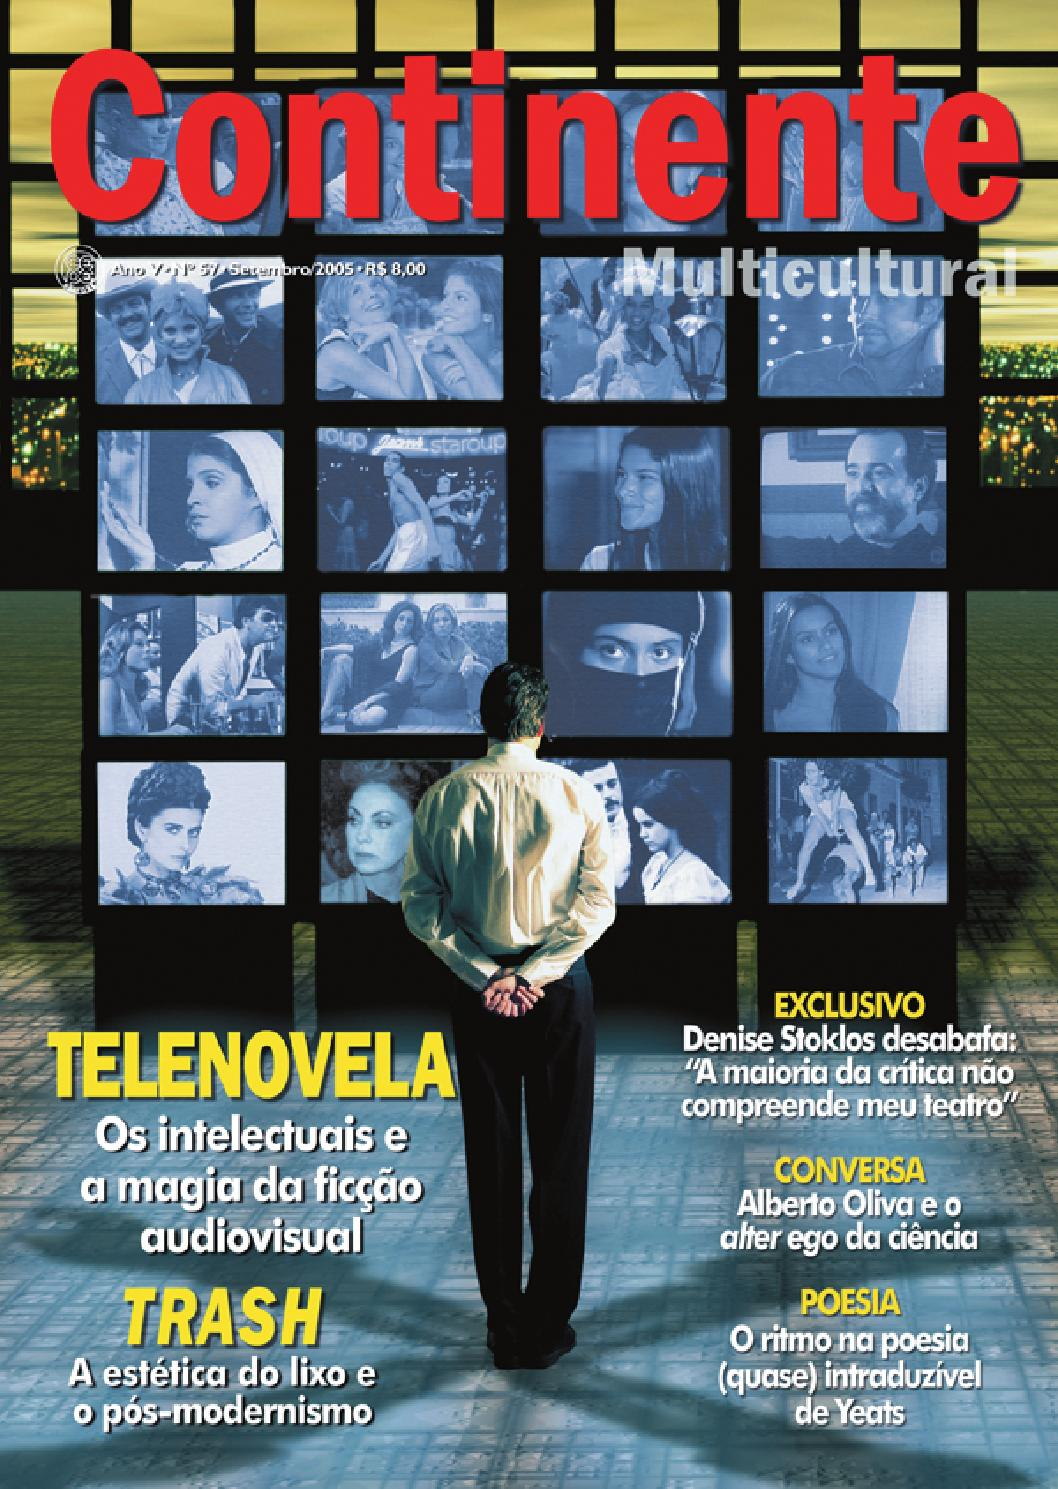 Continente  057 - Telenovela by Revista Continente - issuu 07f9d55cb7